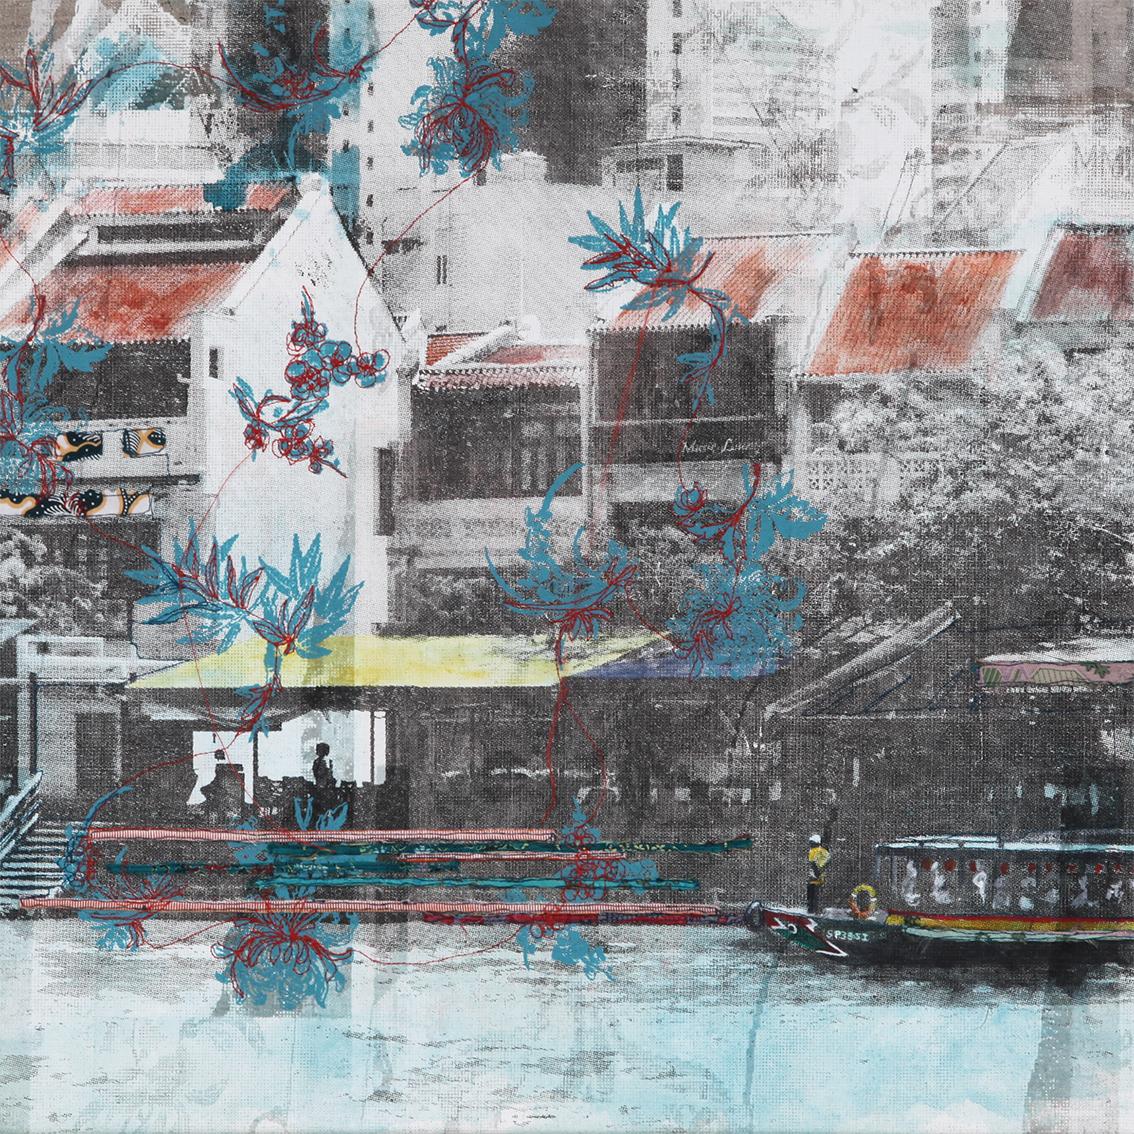 The Man & The Boat_RGB_low.jpg